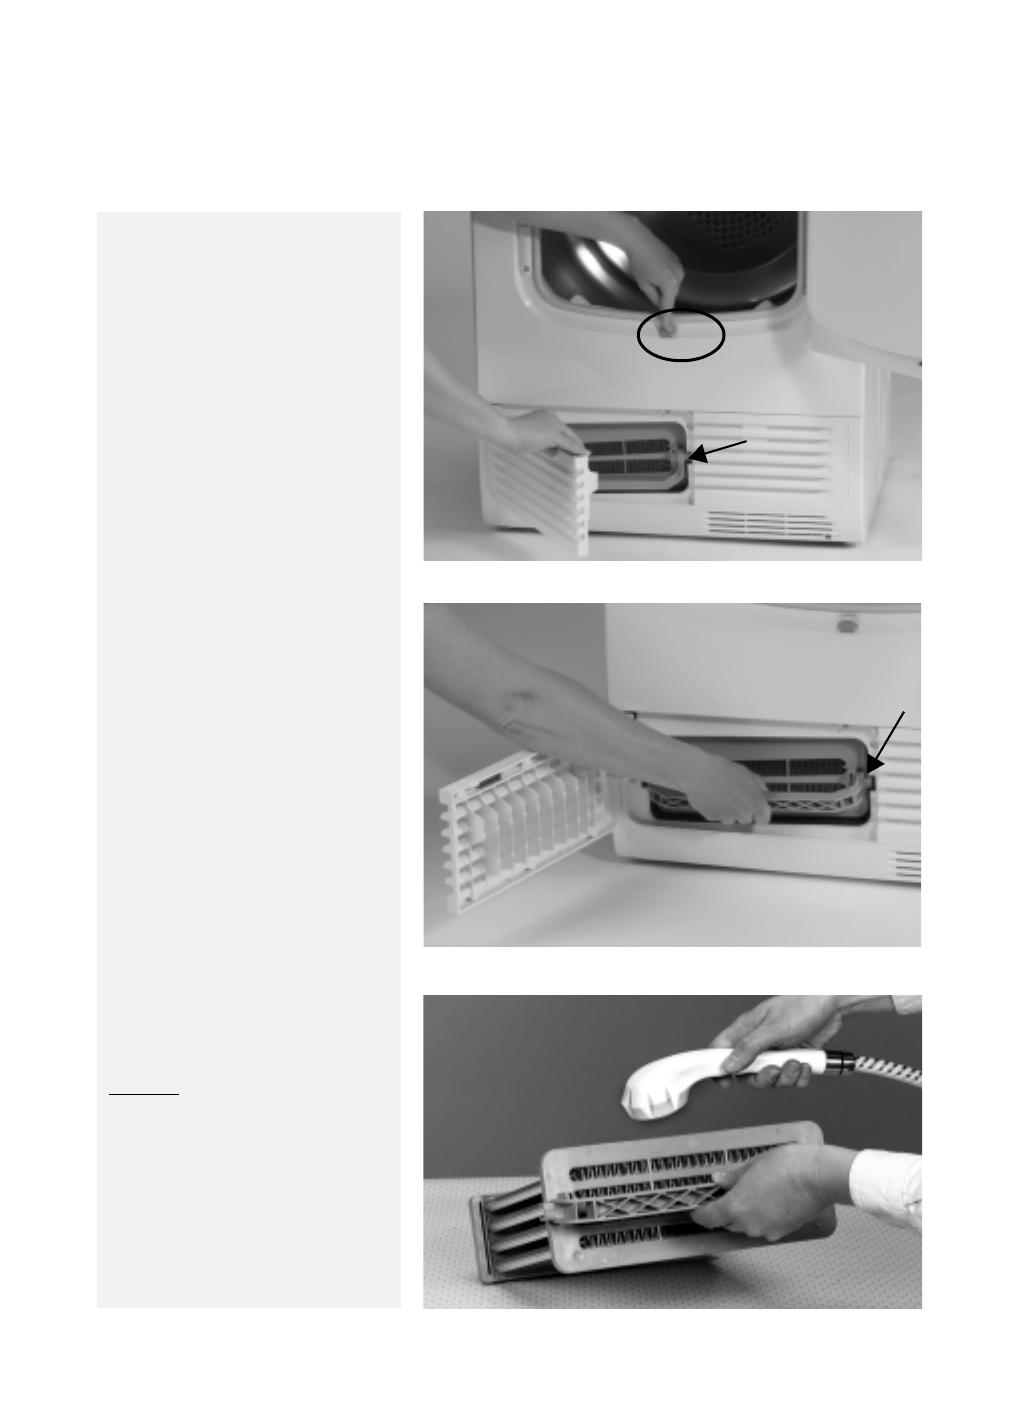 handleiding bauknecht trkd eco 270 pagina 8 van 9 deutsch. Black Bedroom Furniture Sets. Home Design Ideas